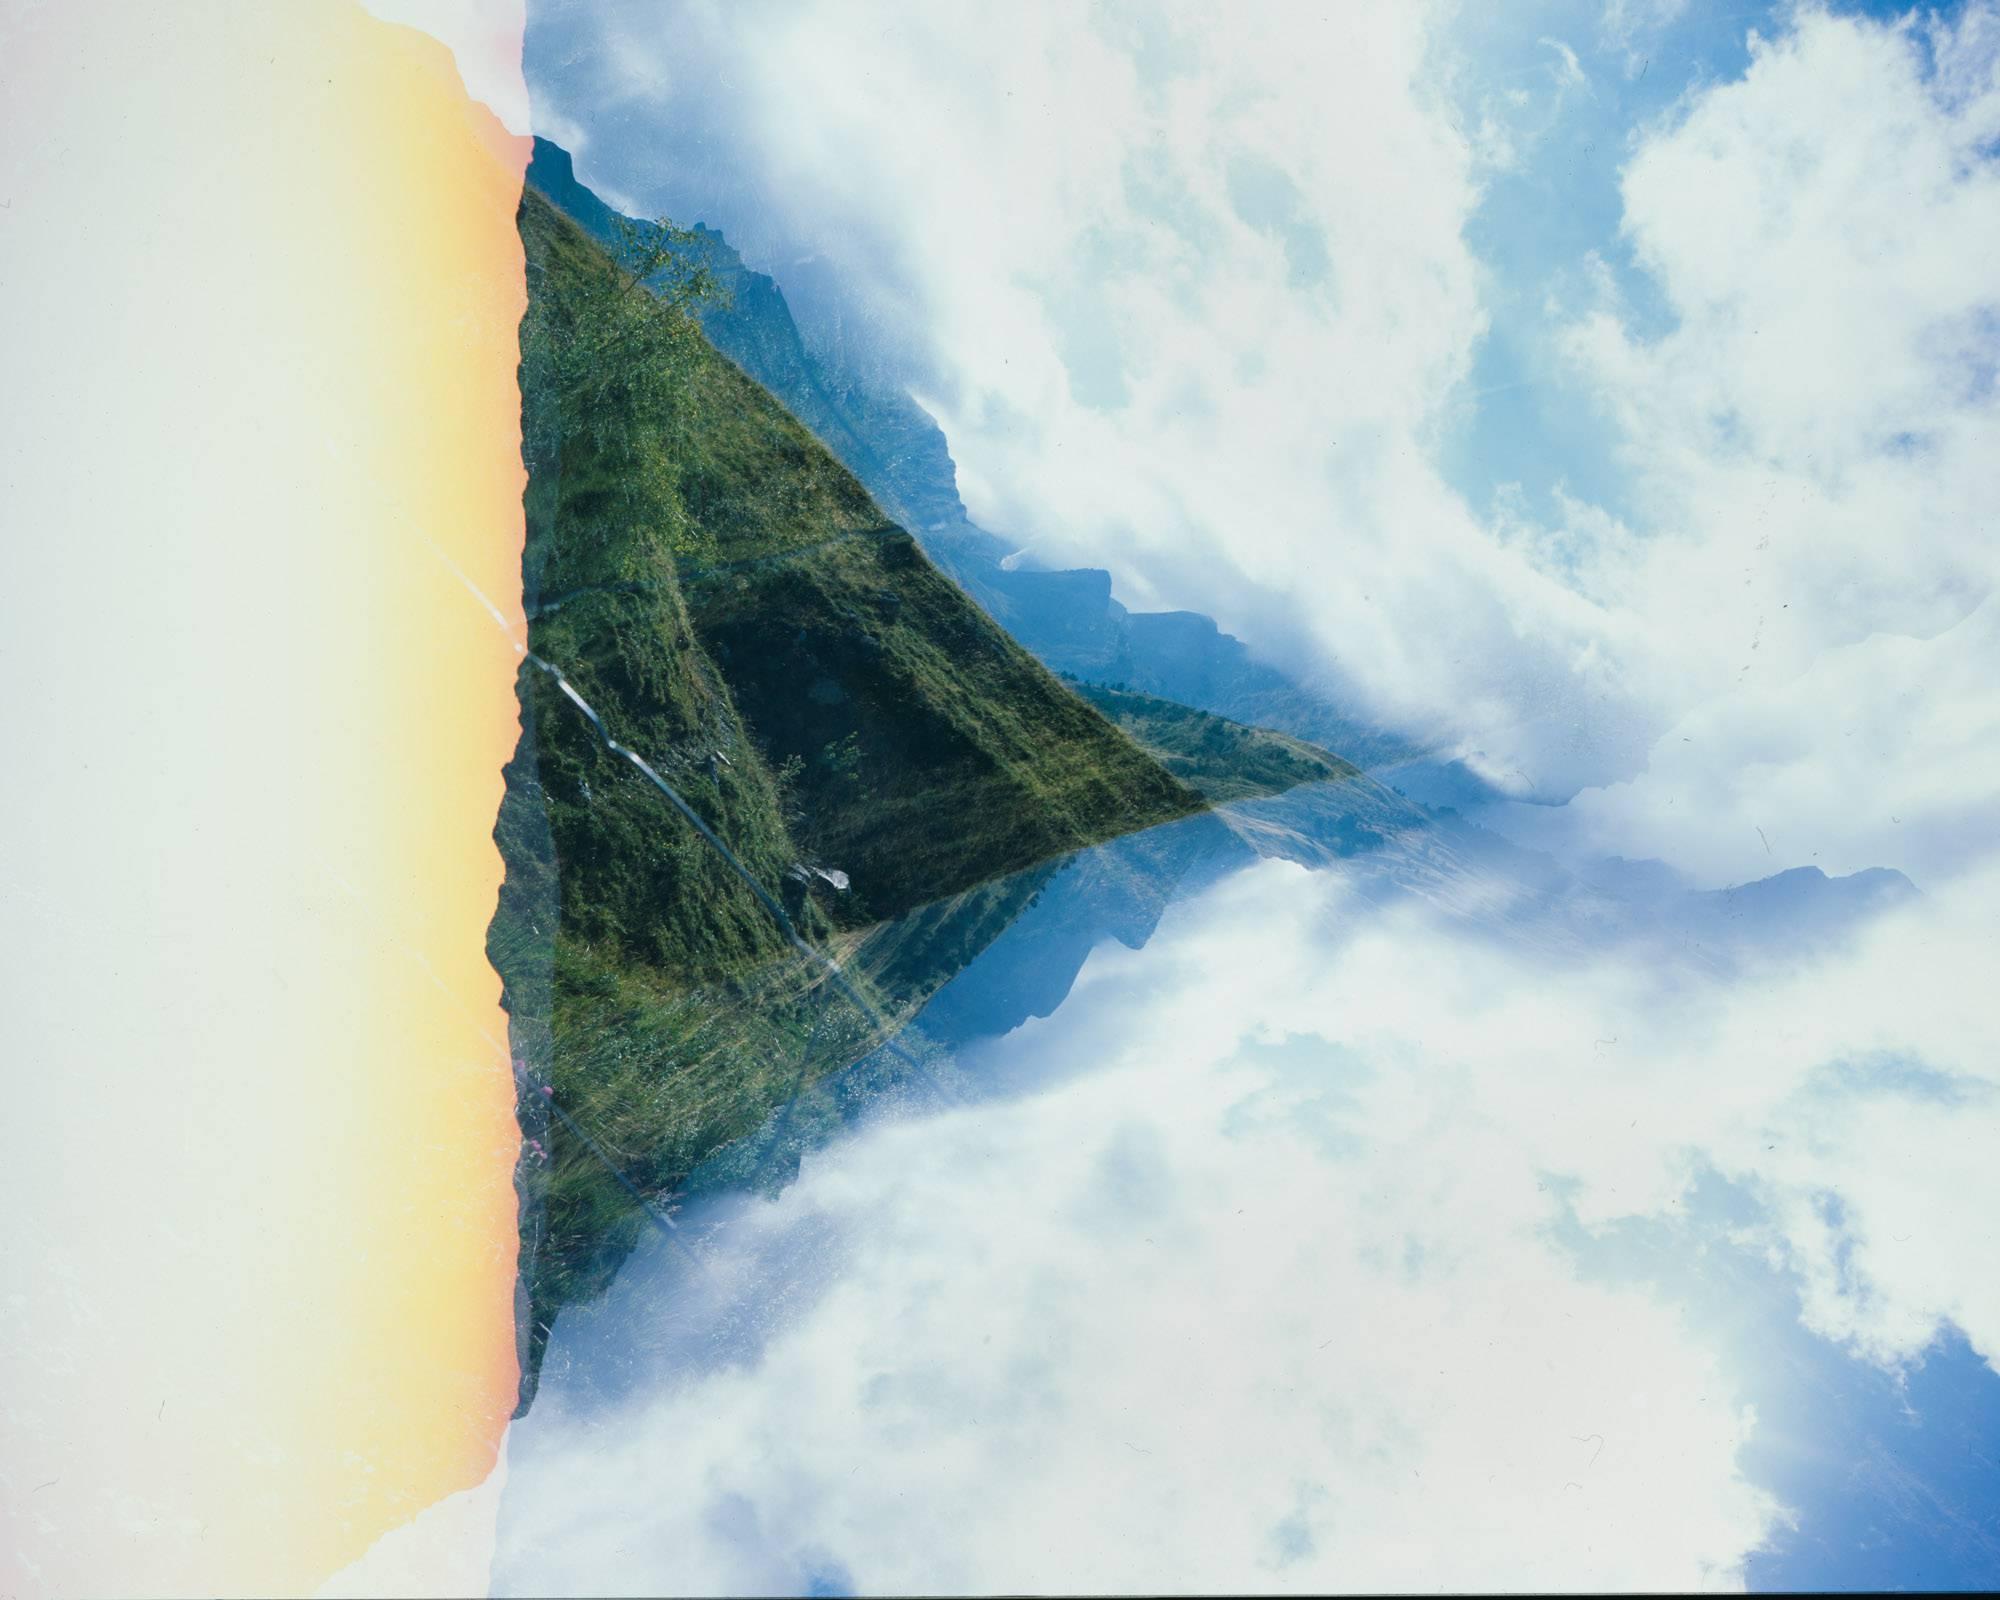 Fractal horizons